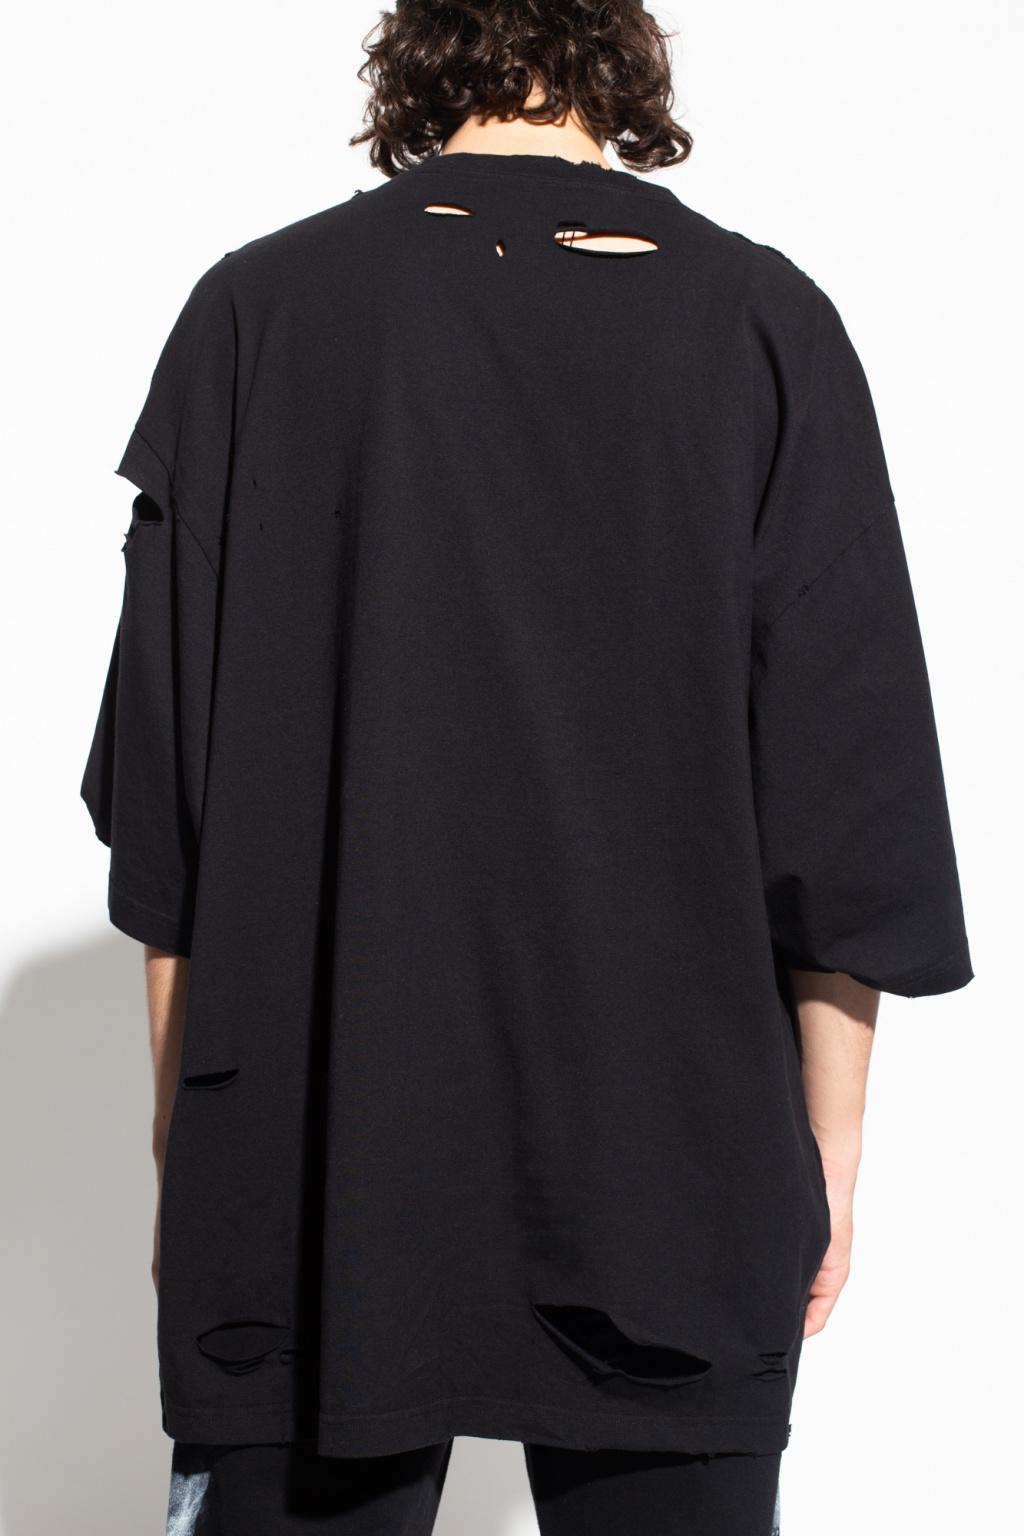 Balenciaga T-shirt with worn effect